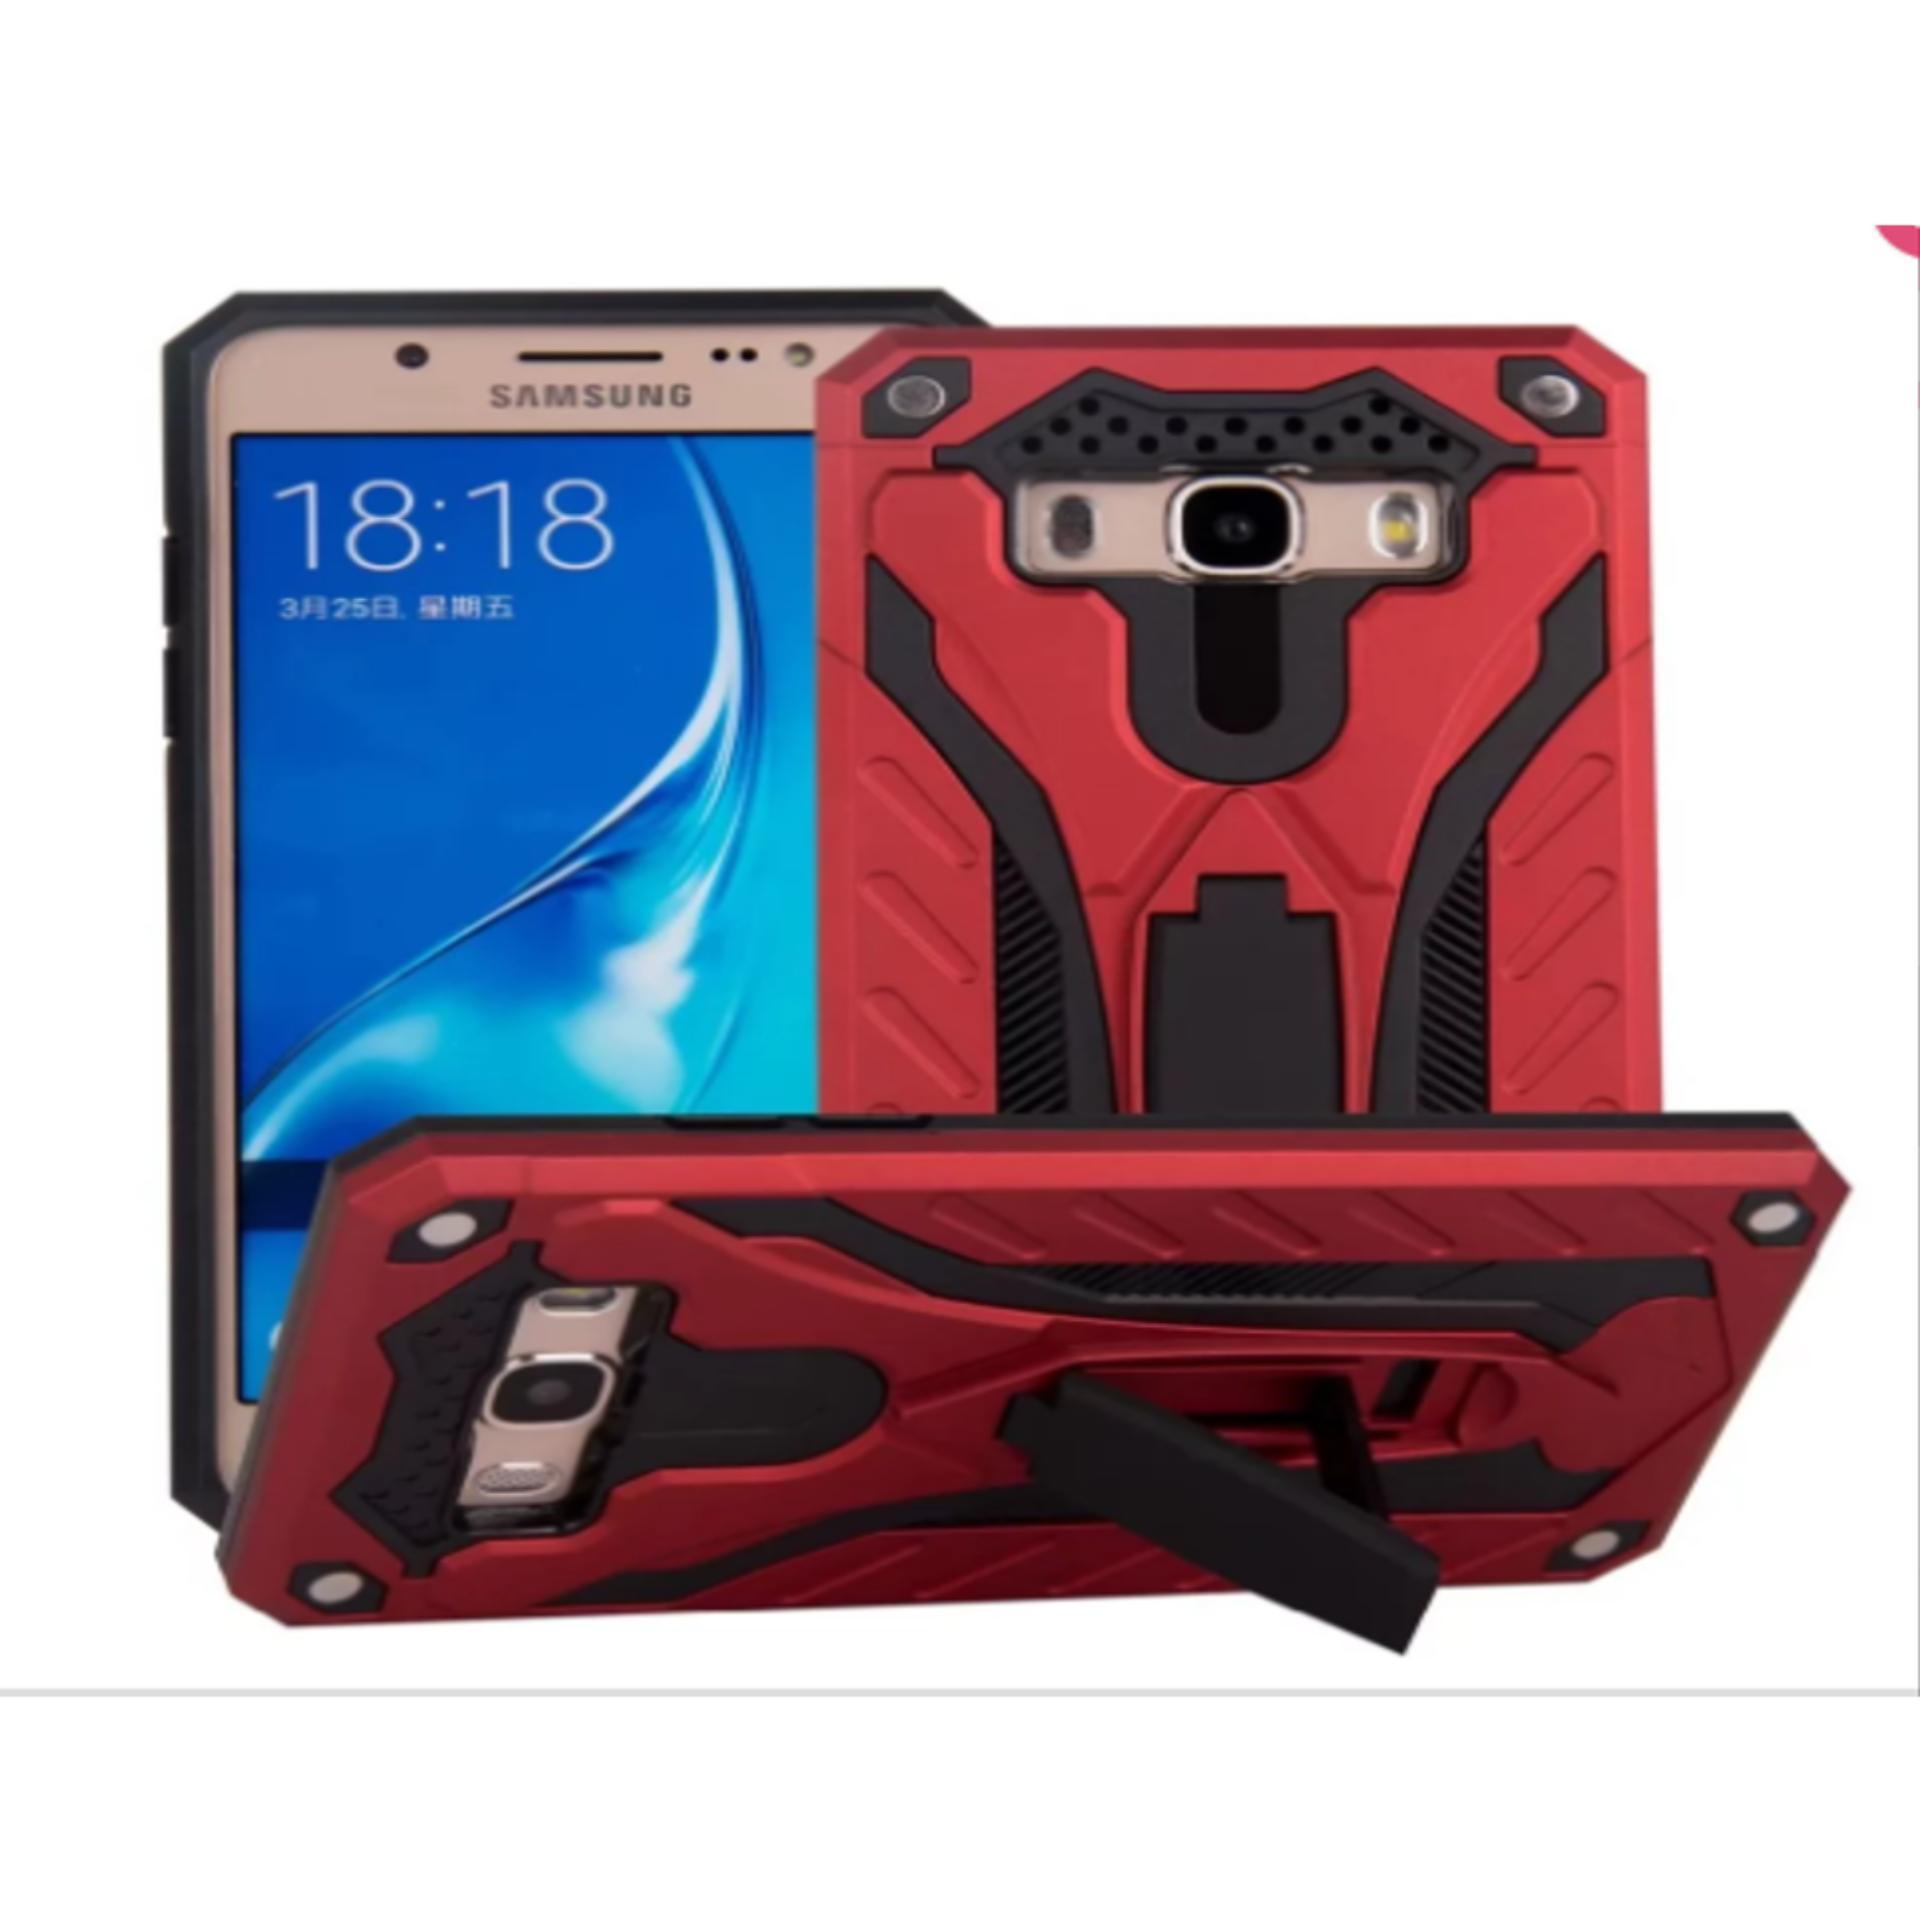 Case Iron Man For Xiaomi Redmi 4a Robot Transformer Ironman Limited Transformers Standing Note 4 Biru Mi4i Grey Source Executive